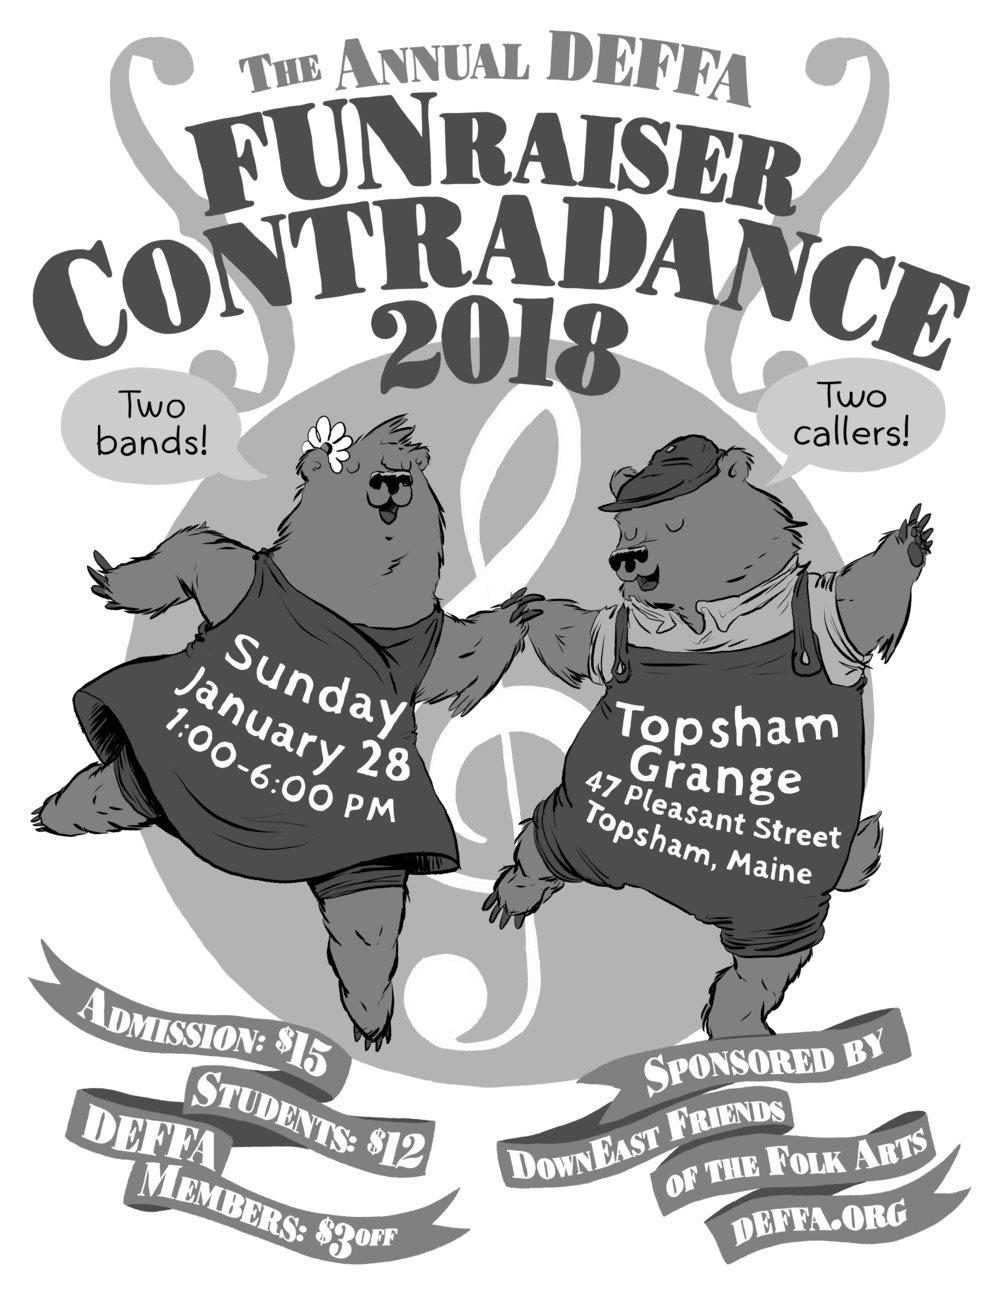 DEFFA Funraiser 2018 Poster 8.5x11.jpg